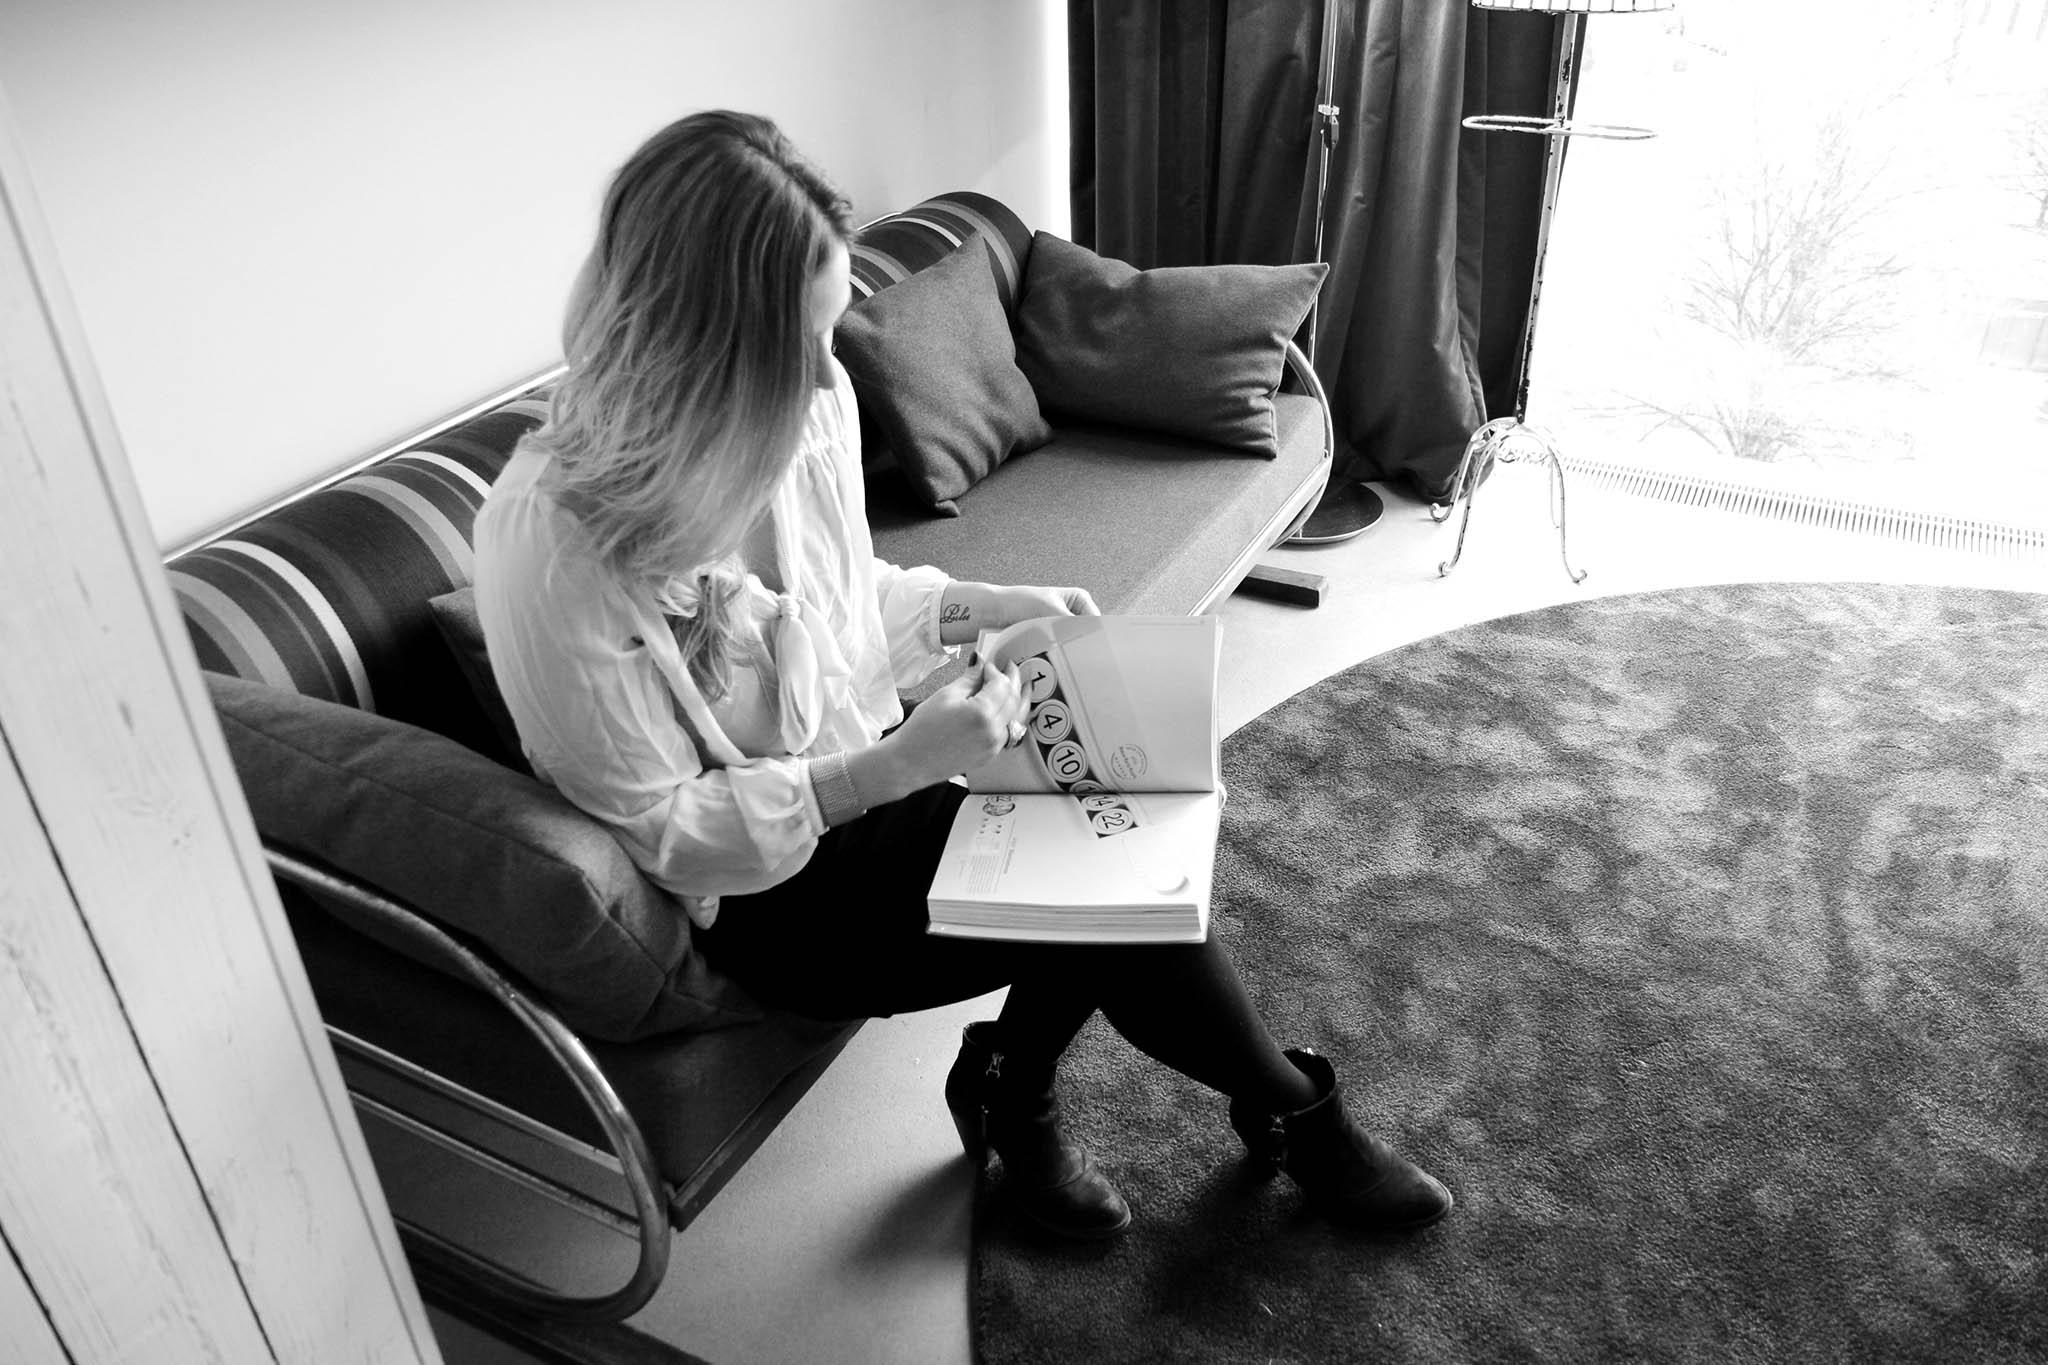 2017-04-25hrs-Hotel-Wien - 25-hours-hotel-vienna-nectarandpulse-interior-2.jpg